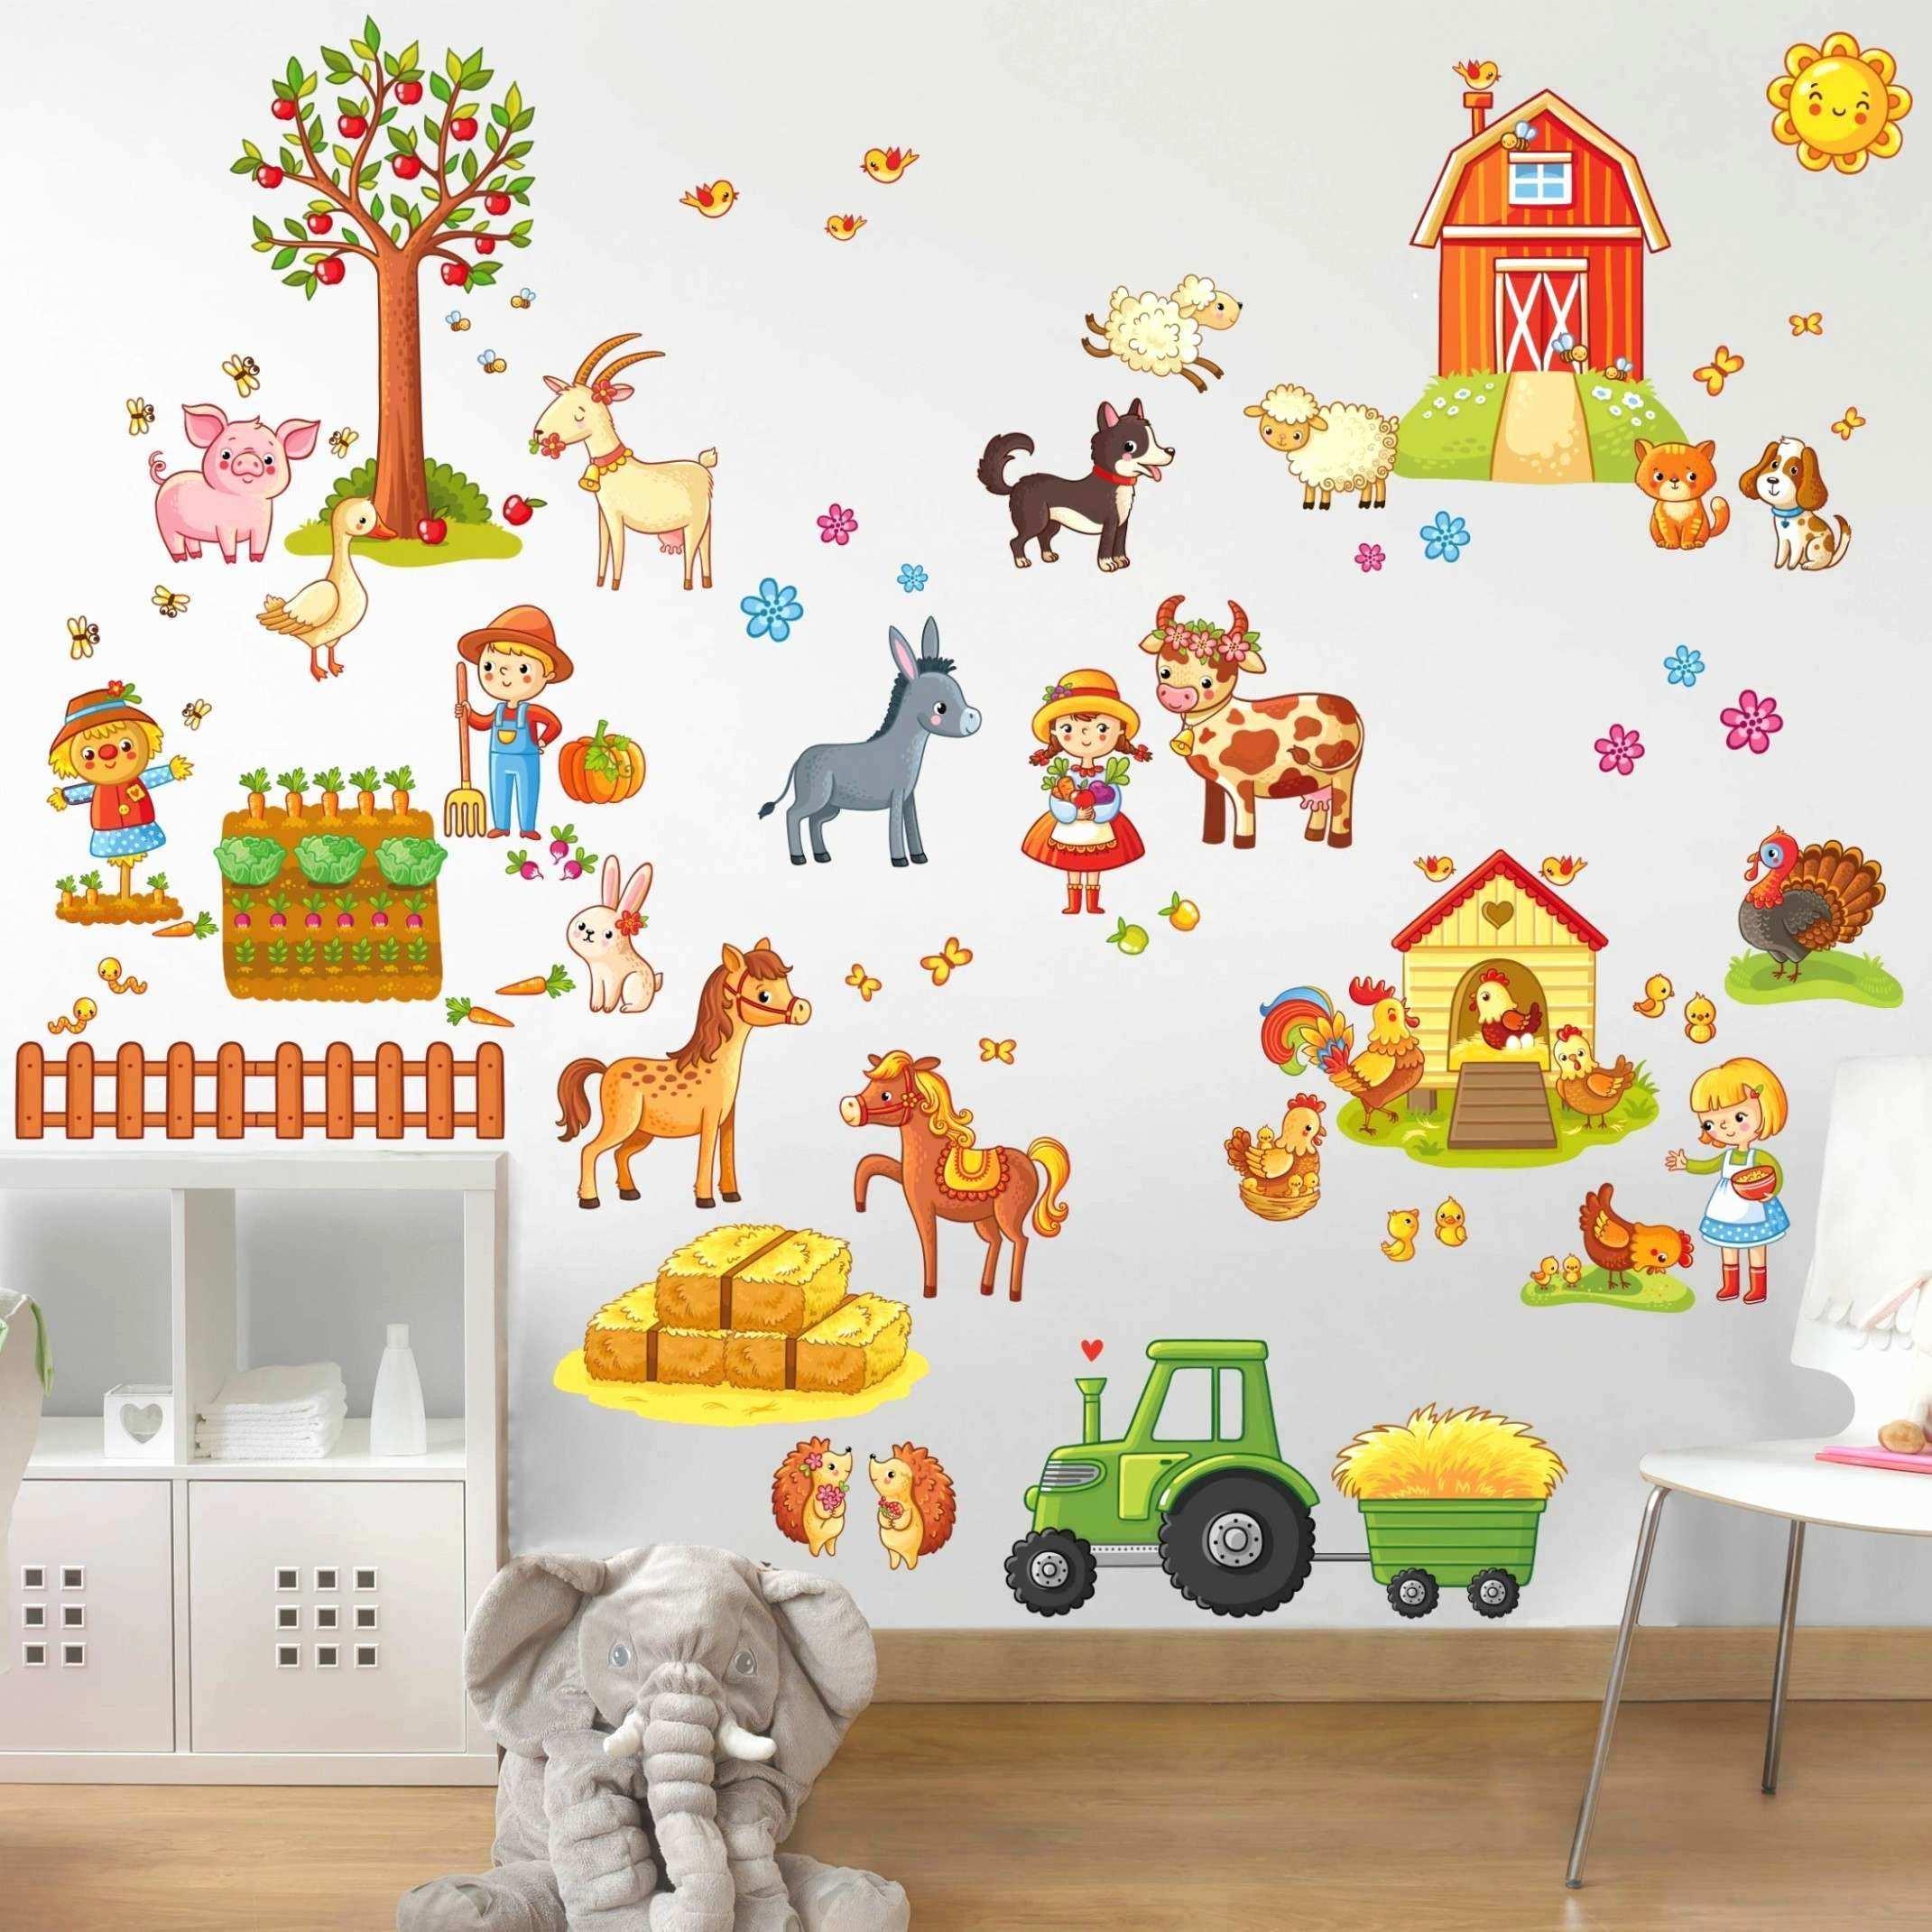 Full Size of 59 Inspirierend Wandtattoo Tiere Kinderzimmer Frisch Tolles Regal Sofa Regale Weiß Kinderzimmer Wandaufkleber Kinderzimmer